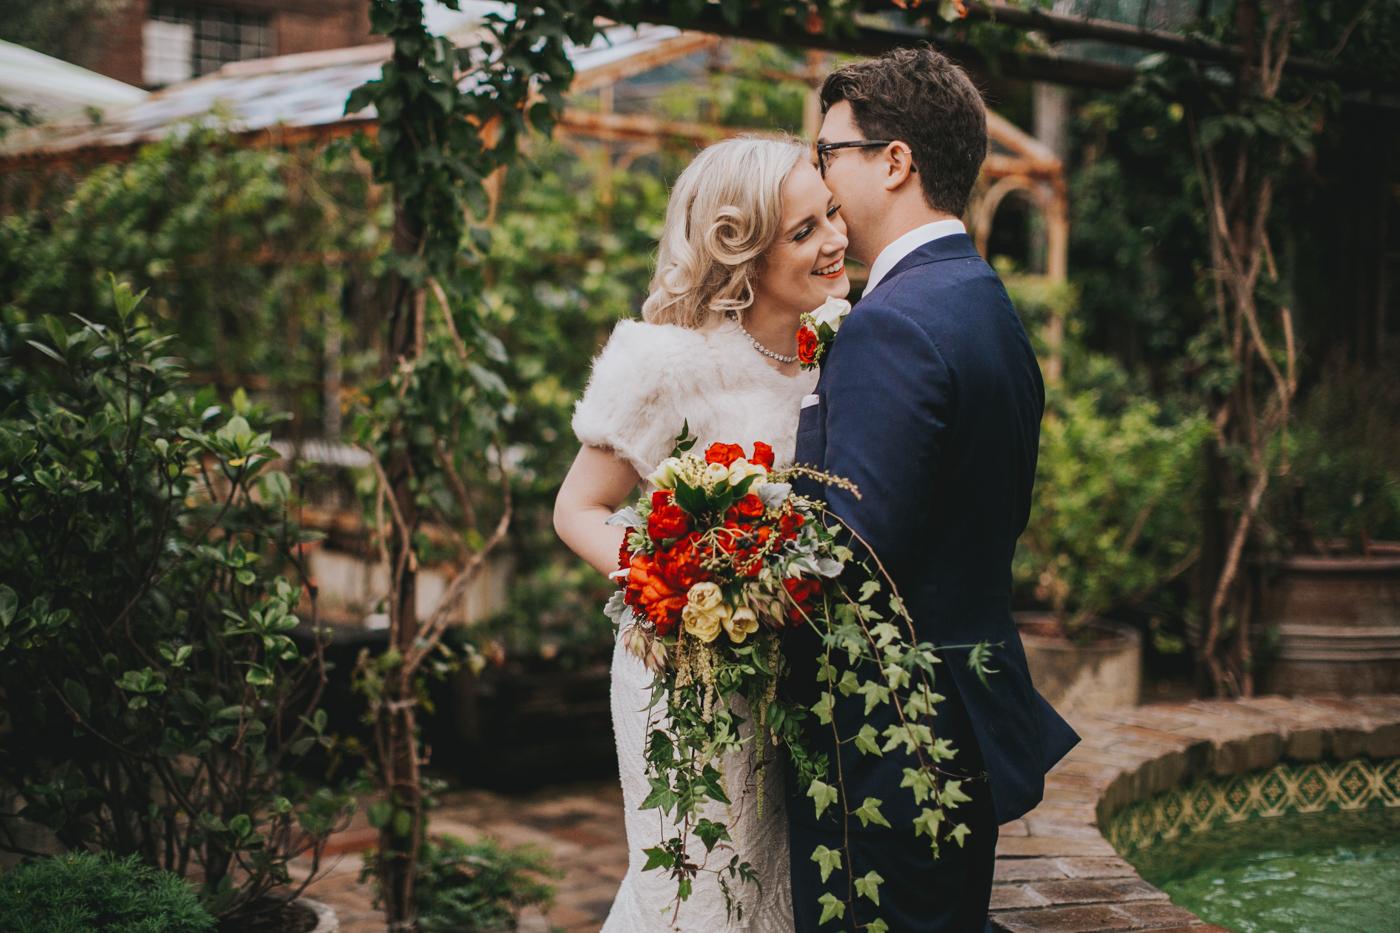 Jo & Tom Wedding - The Grounds of Alexandria - Samantha Heather Photography-214.jpg